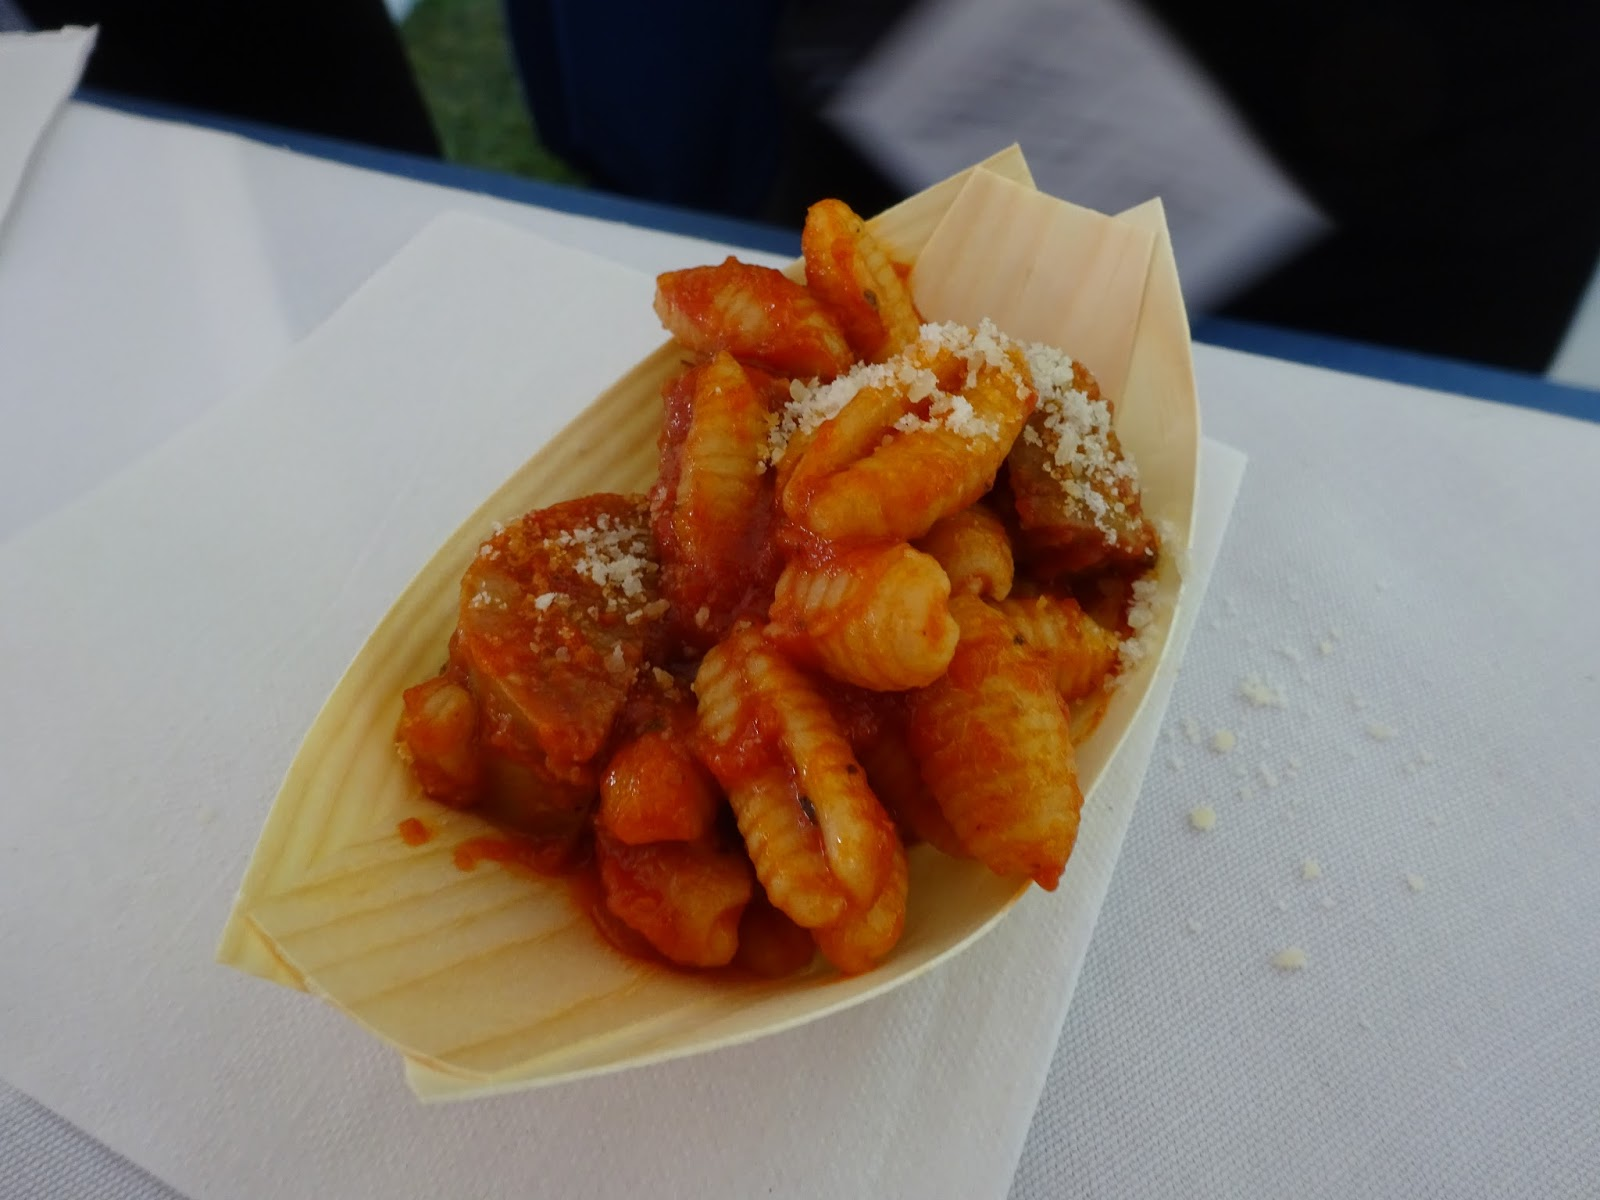 Filomena S Italian Kitchen Market Costa Mesa Ca